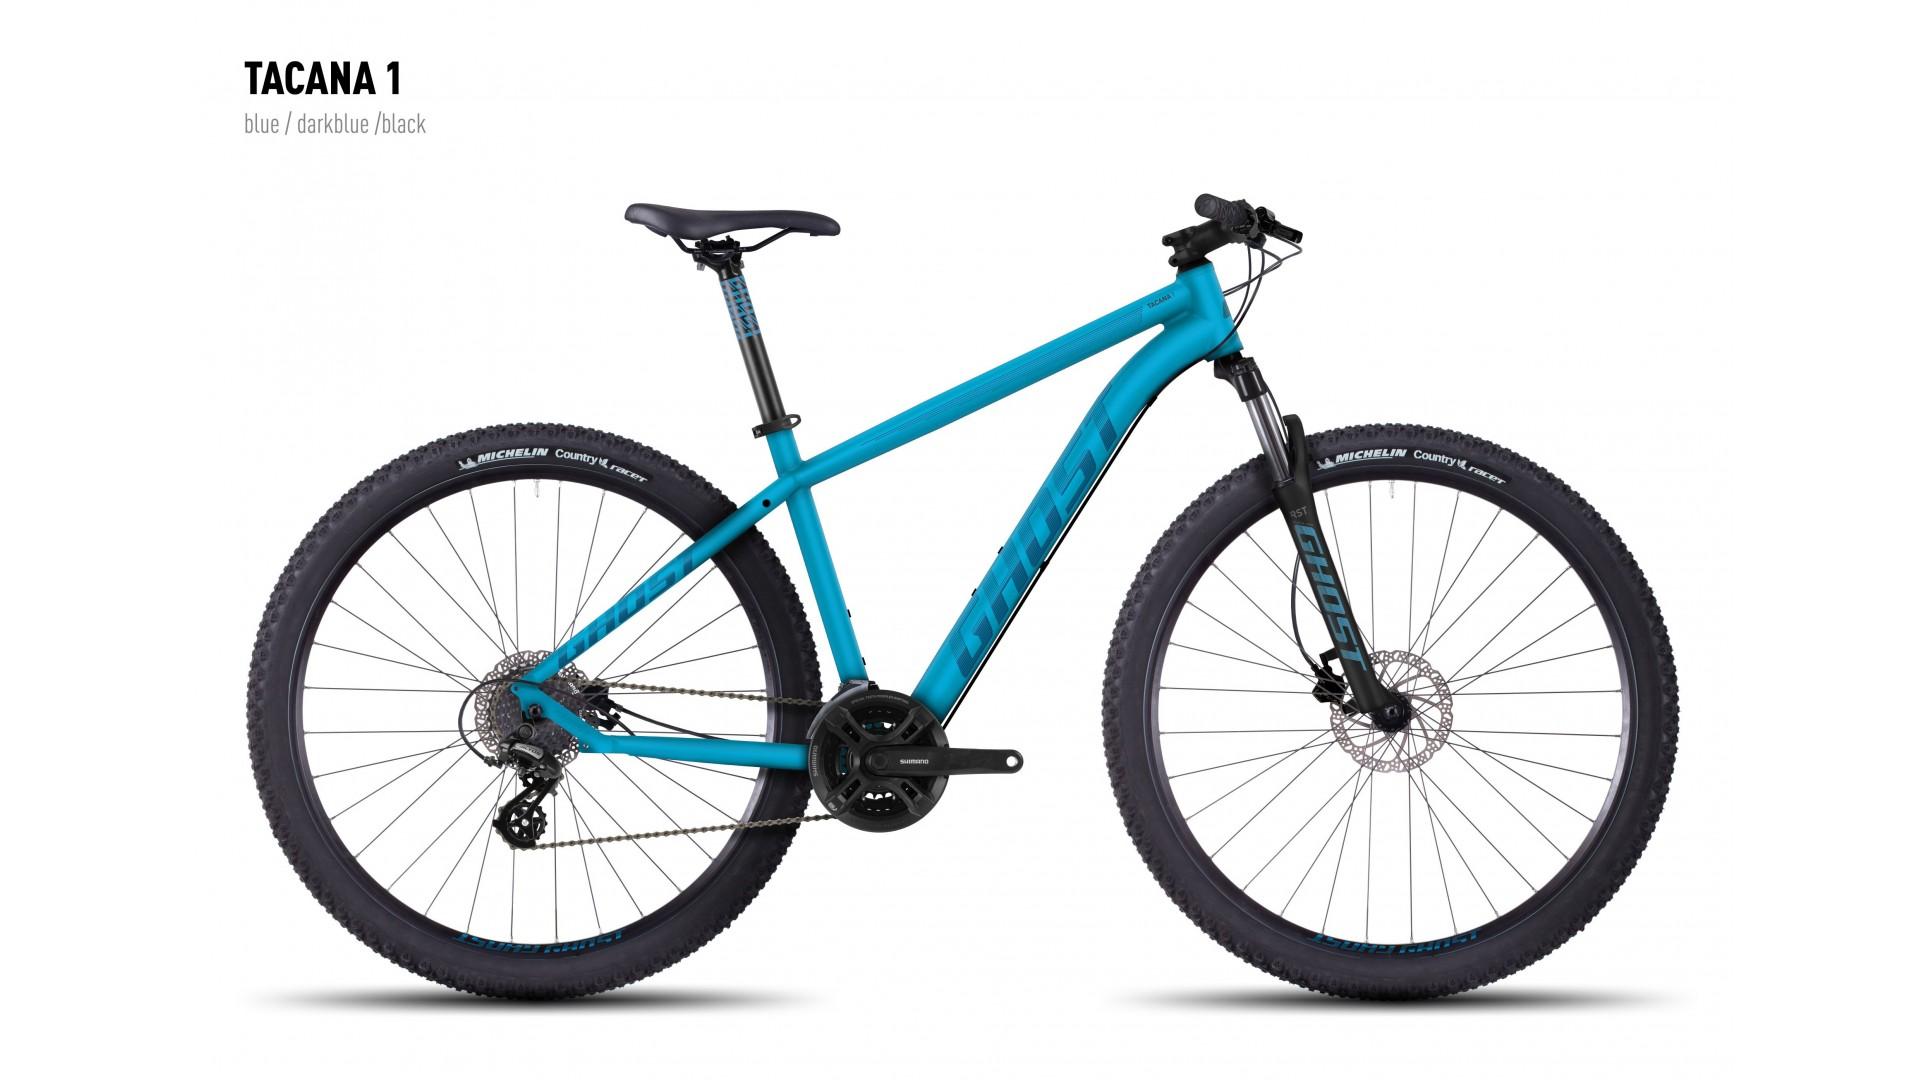 Велосипед GHOST Tacana 1 blue/darkblue/black год 2016